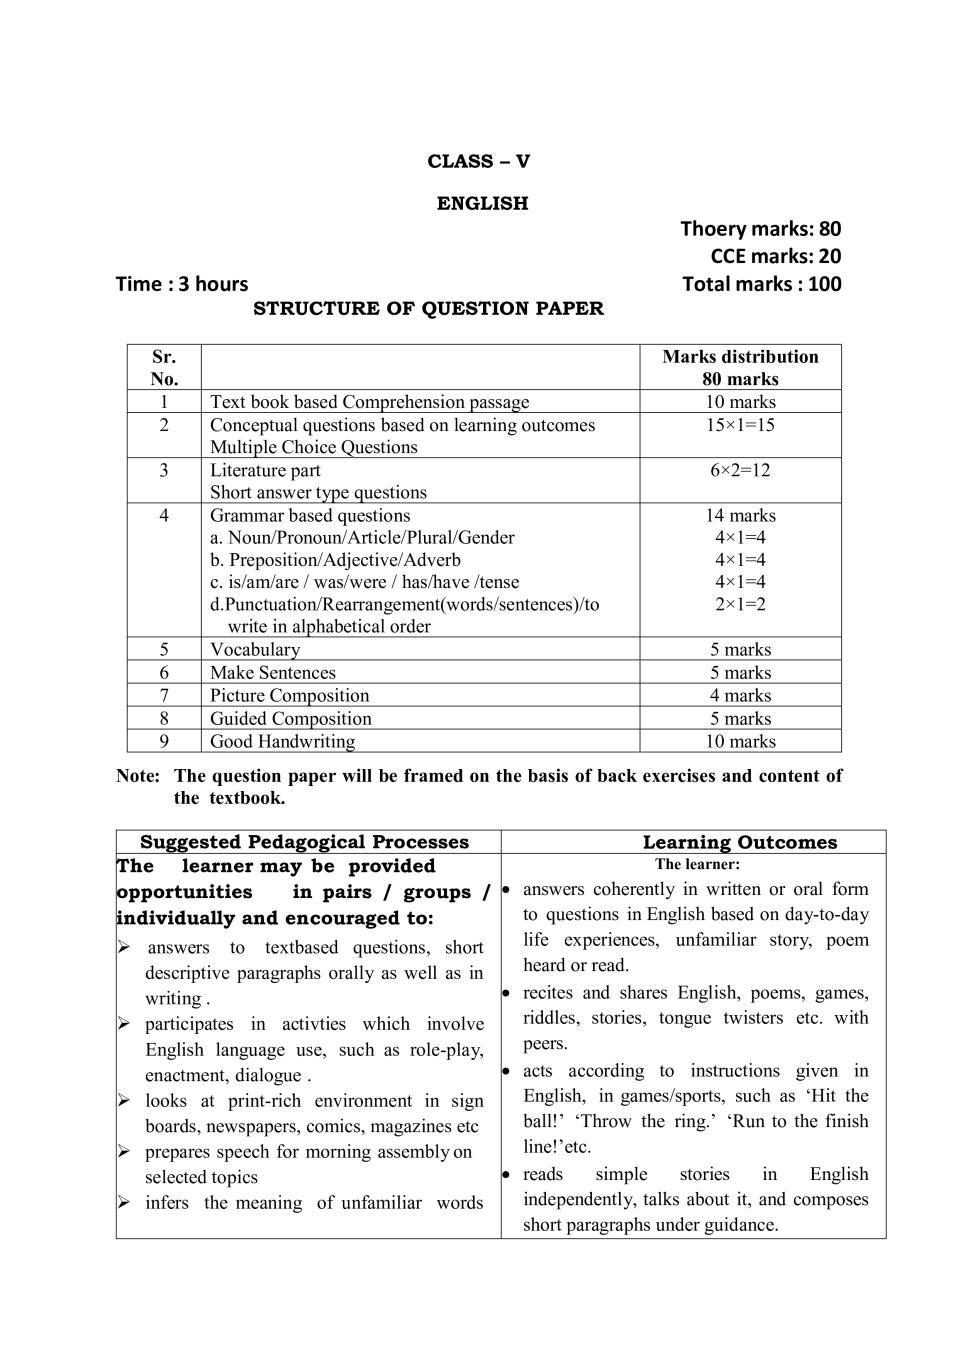 PSEB Syllabus 2020-21 for Class 5 English - Page 1